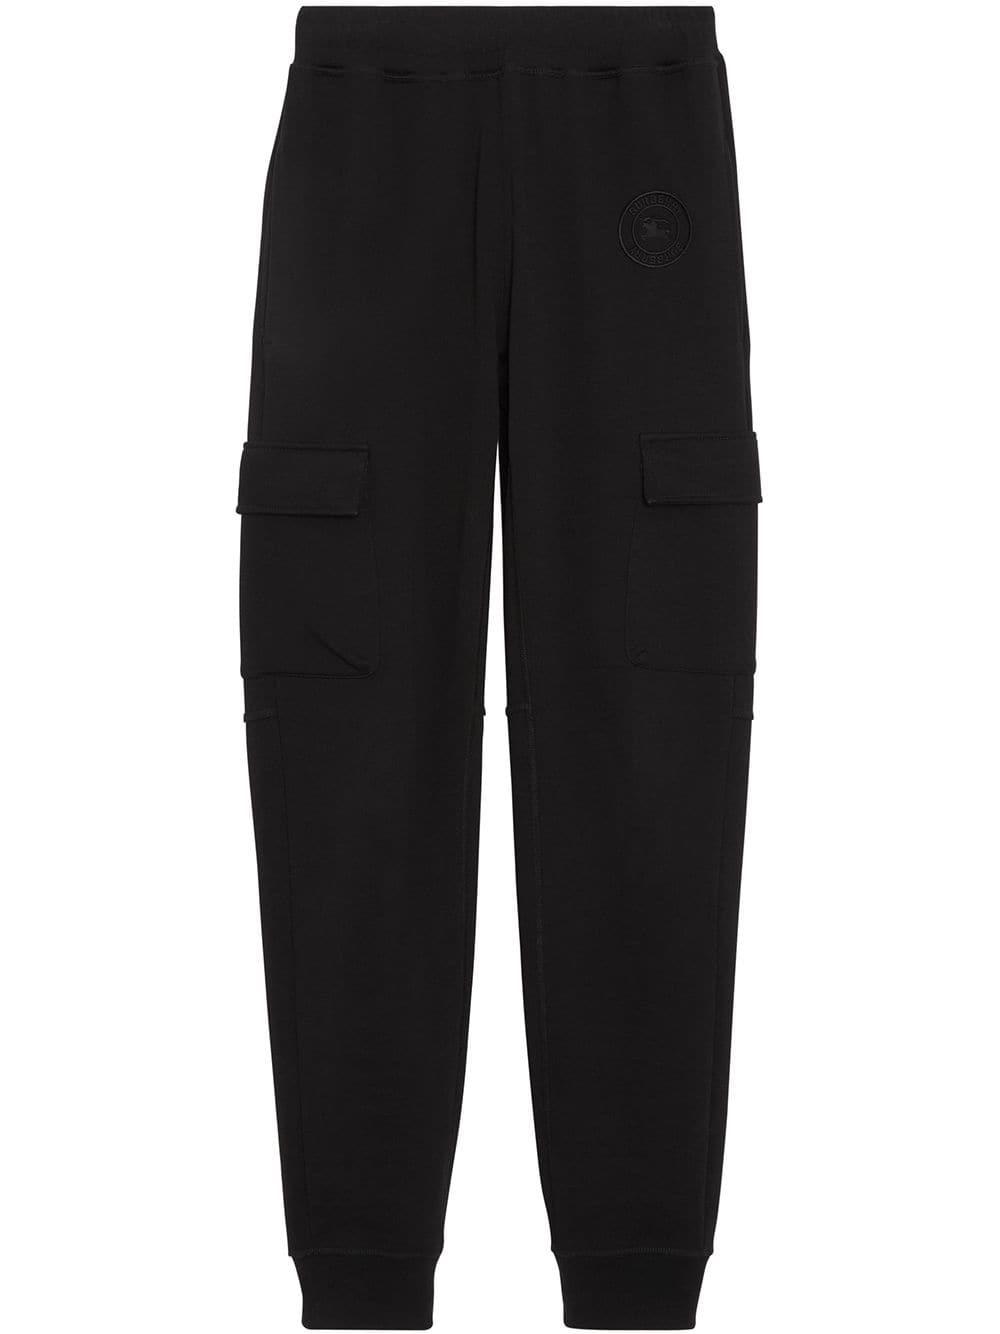 England London Burberry Pantaloni Justley 26272 Su 0wNZX8nOPk